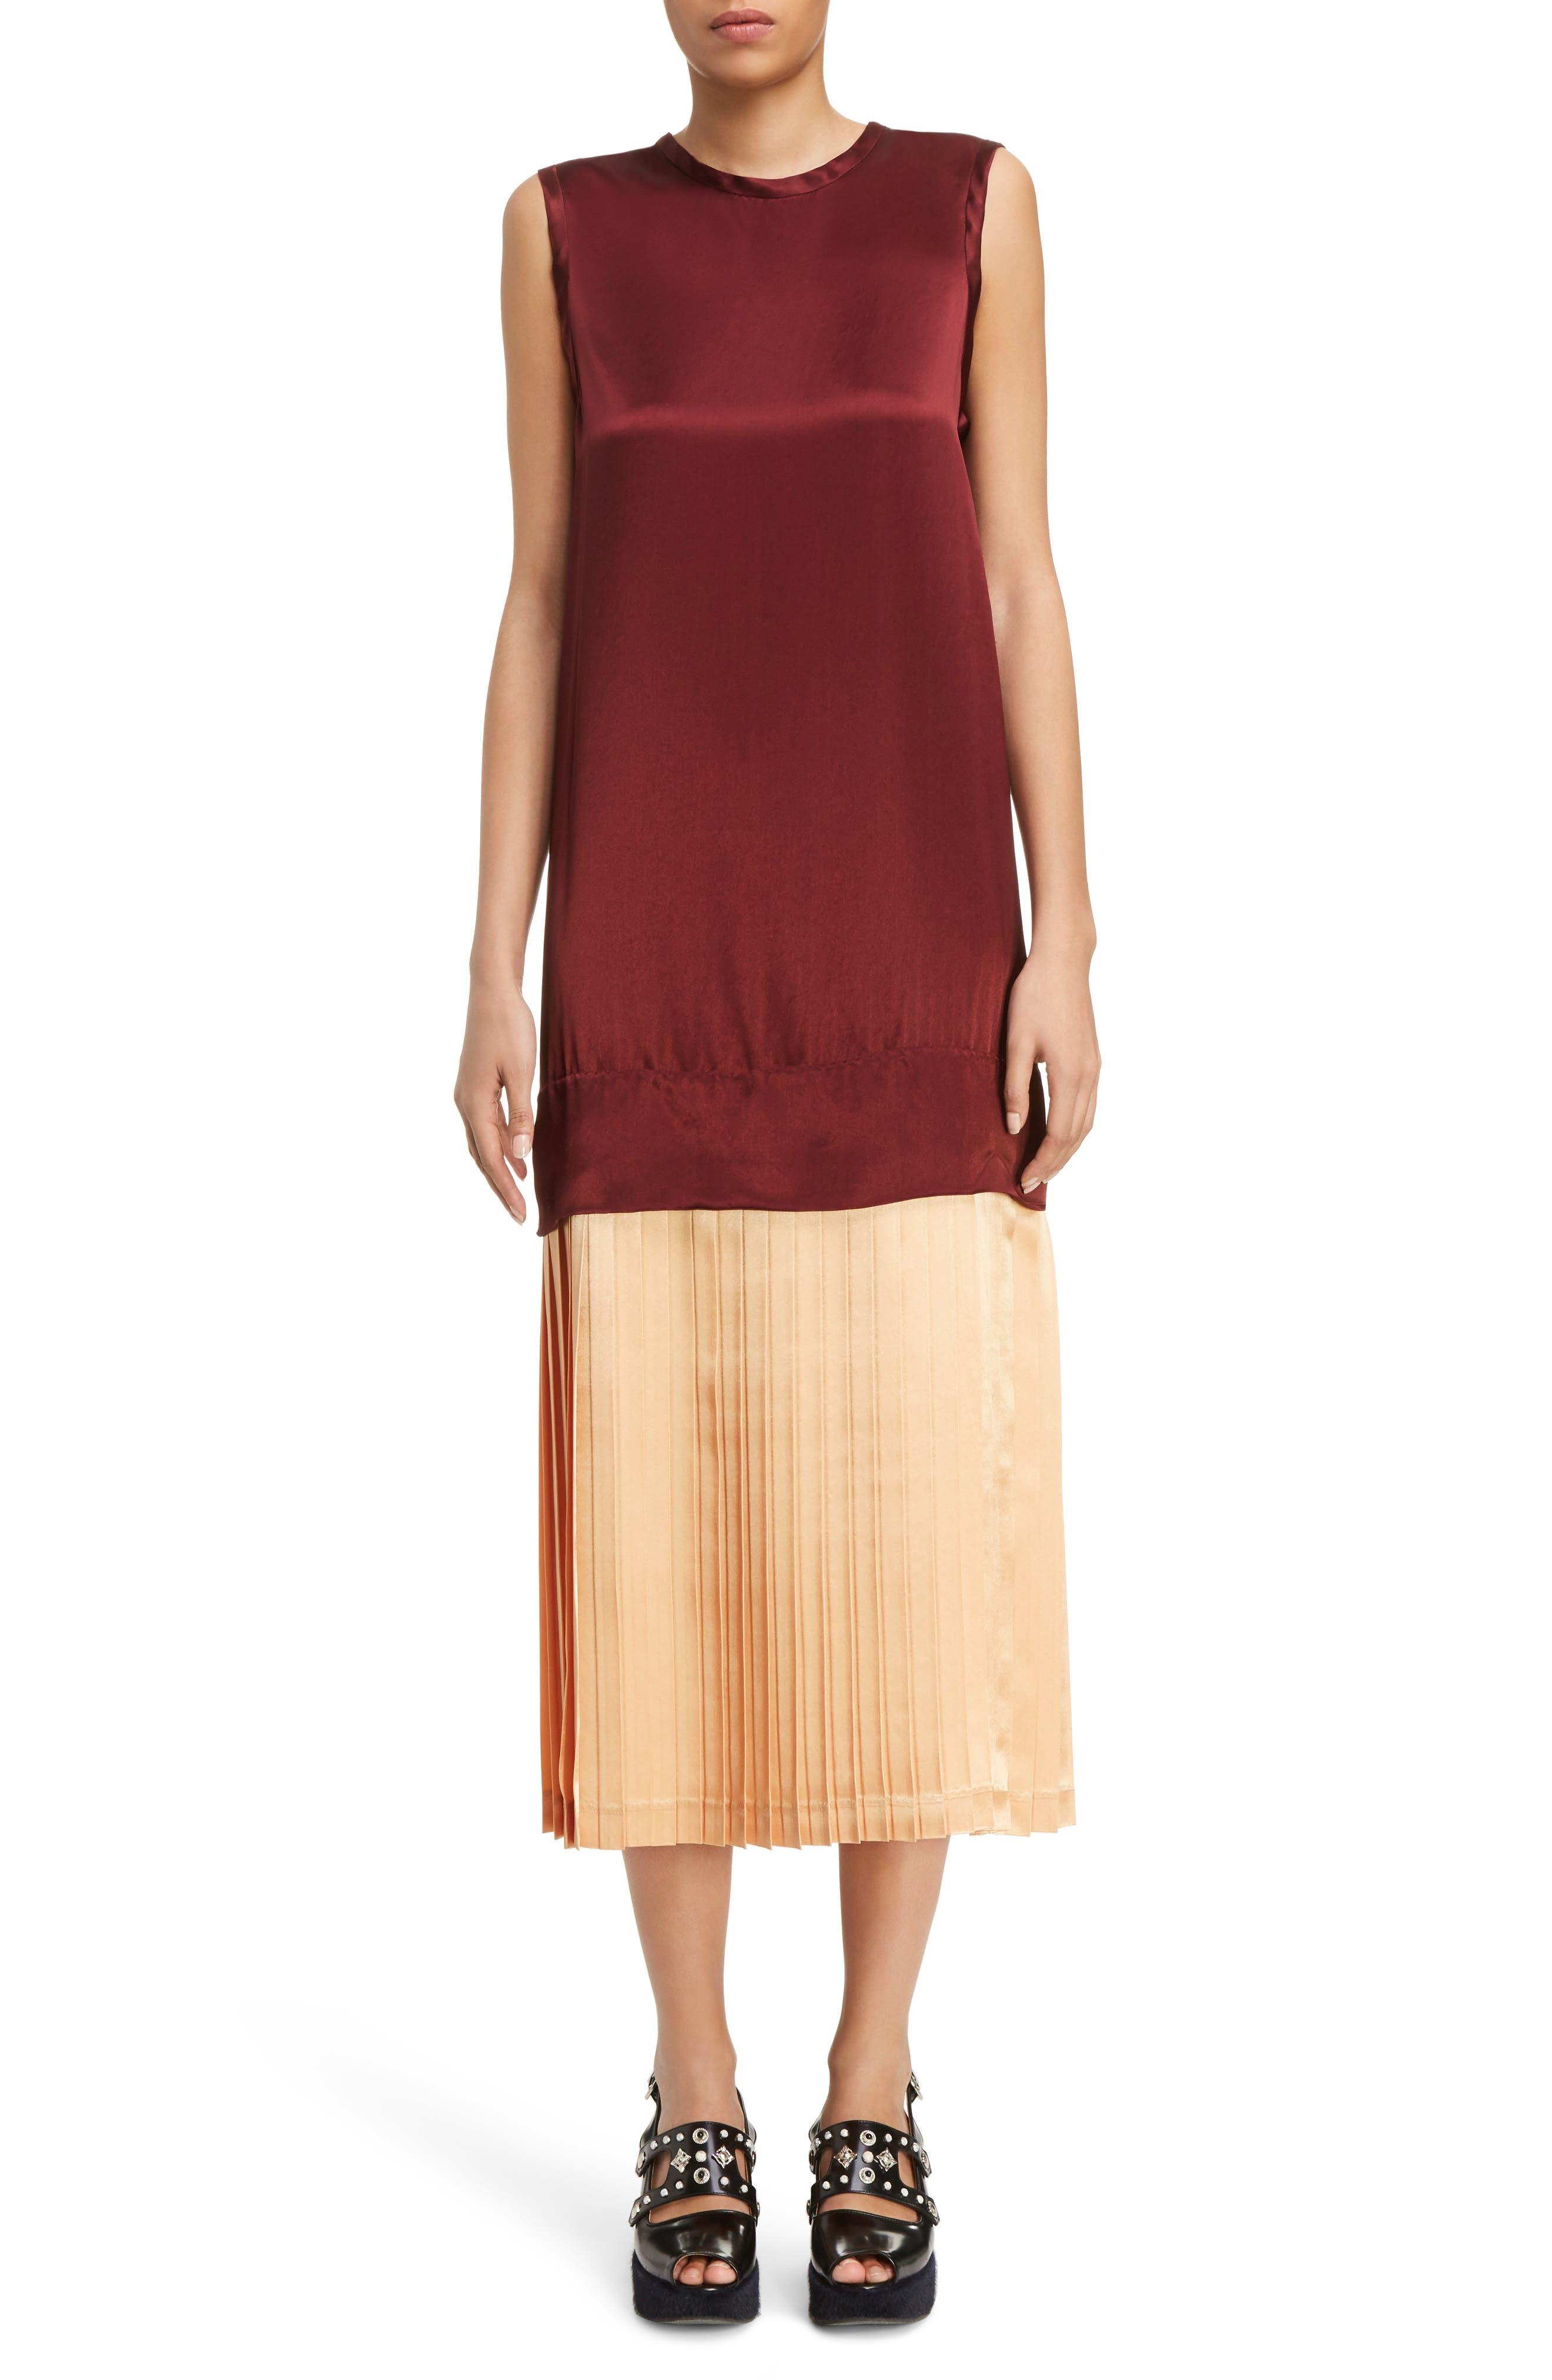 TOGA Mock Two-Piece Satin Dress